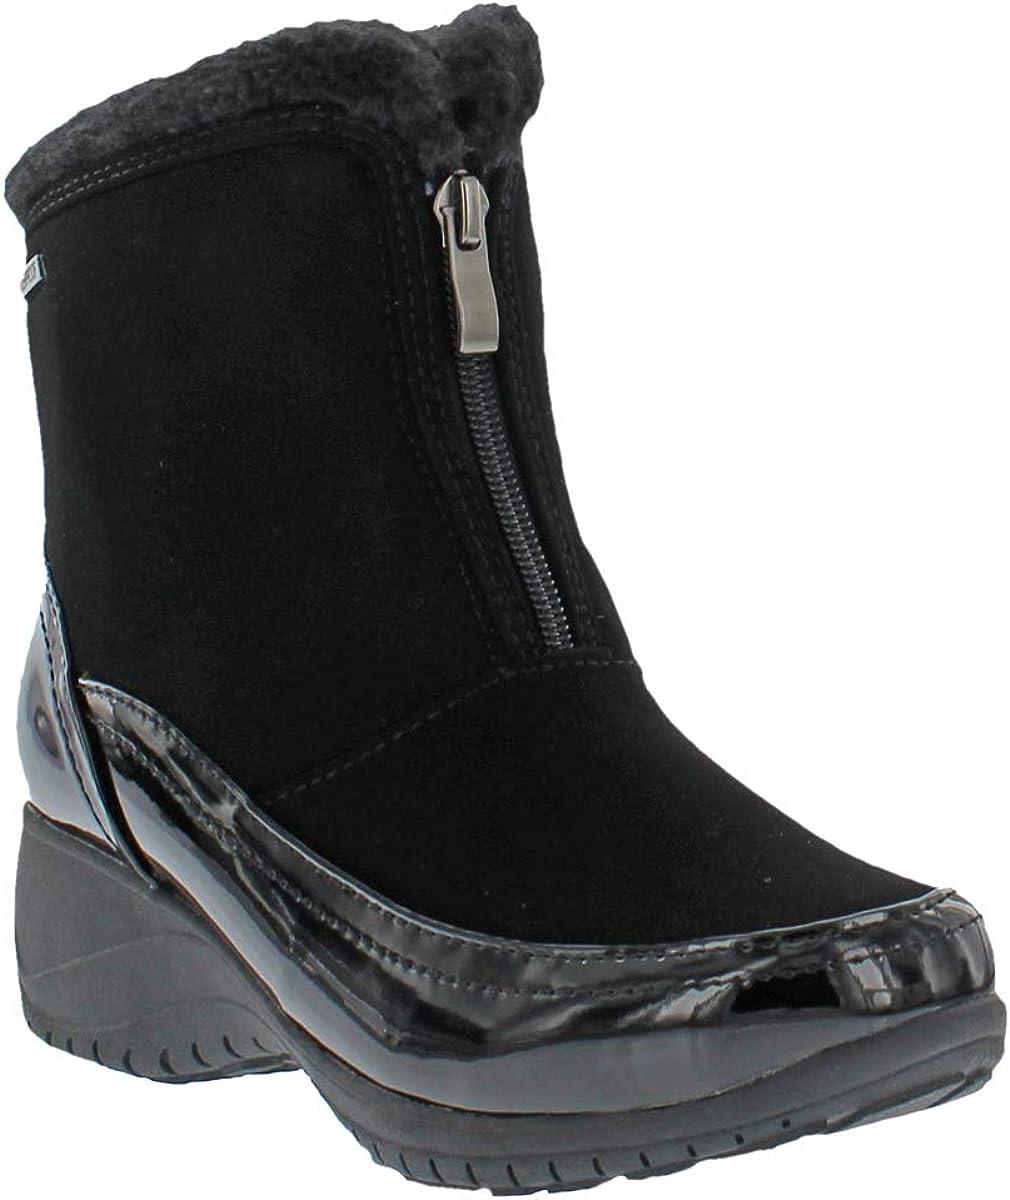 Khombu Alice 3 Boots for Women, Black